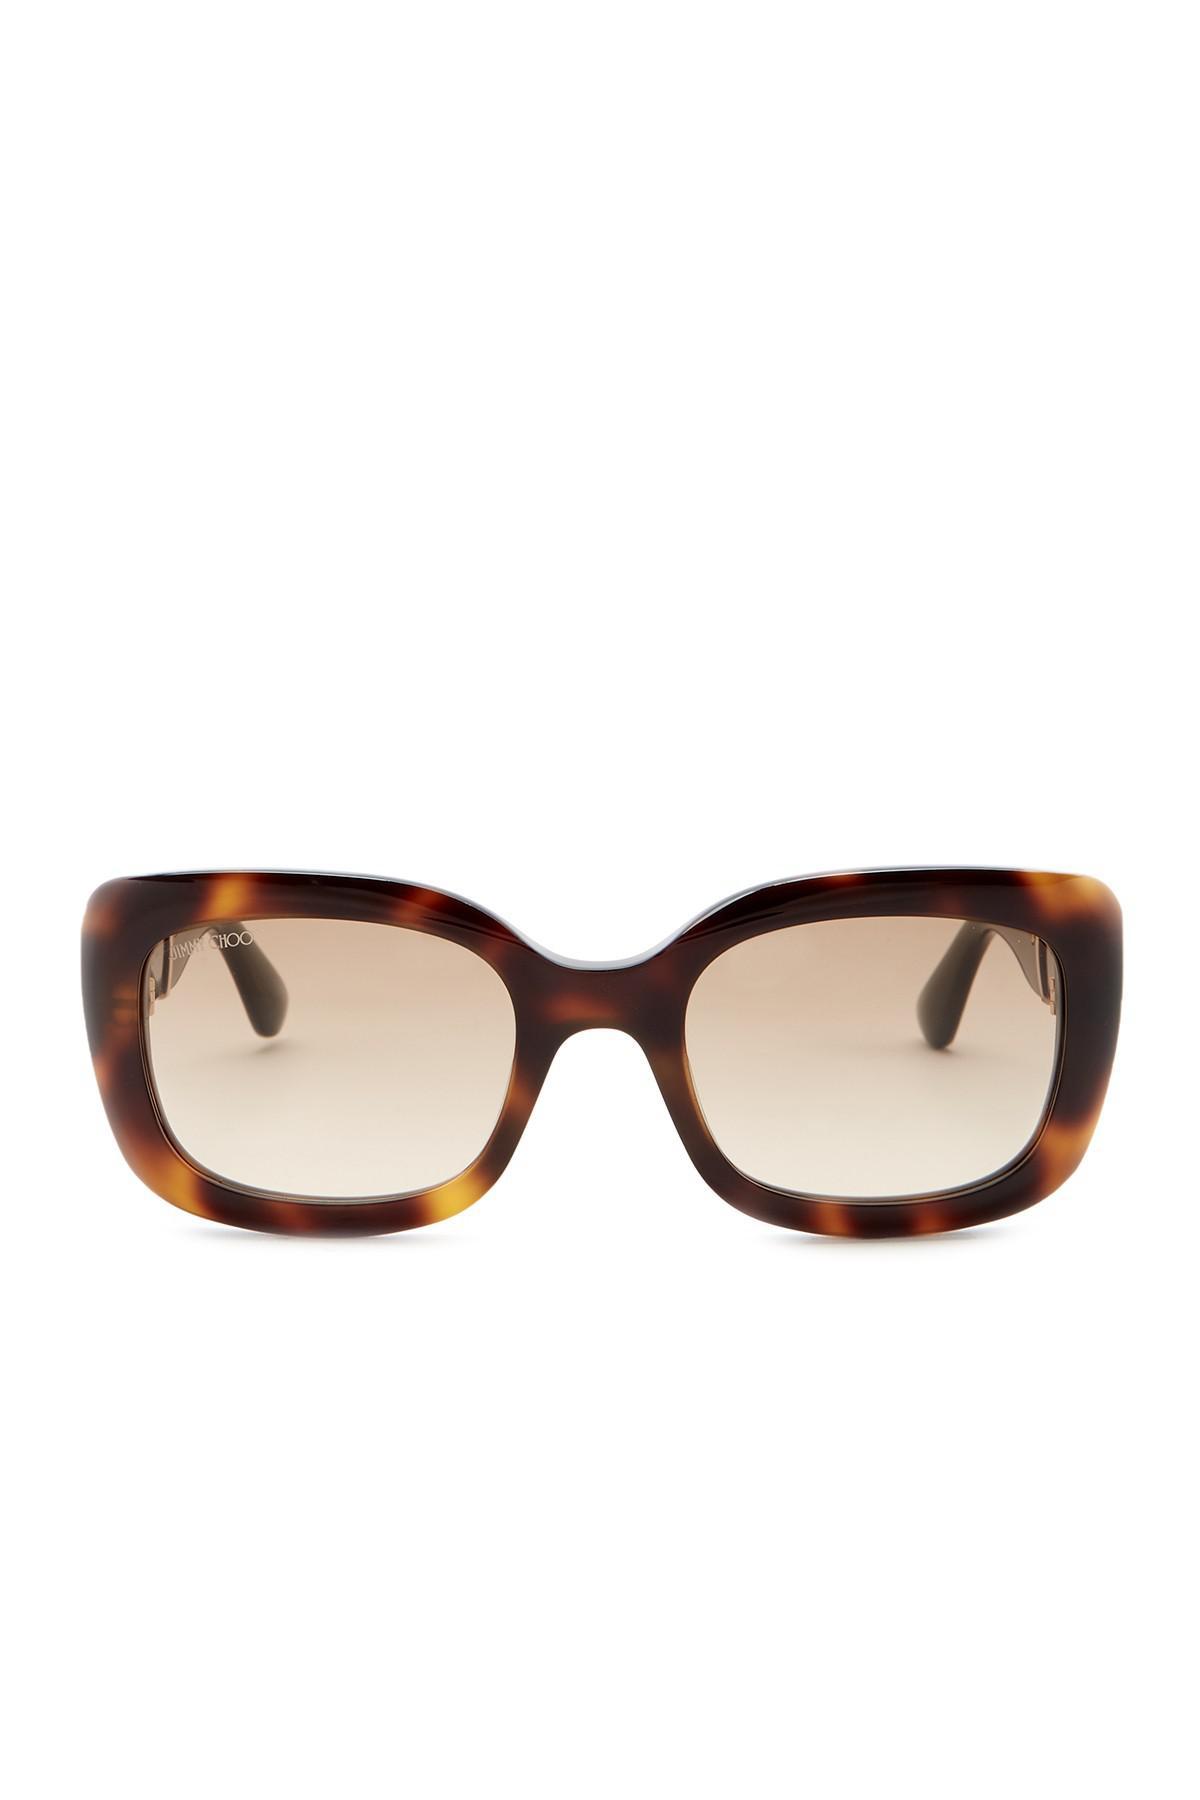 b2ca2fe37f Lyst - Jimmy Choo Vinns 51mm Rectangle Sunglasses in Brown